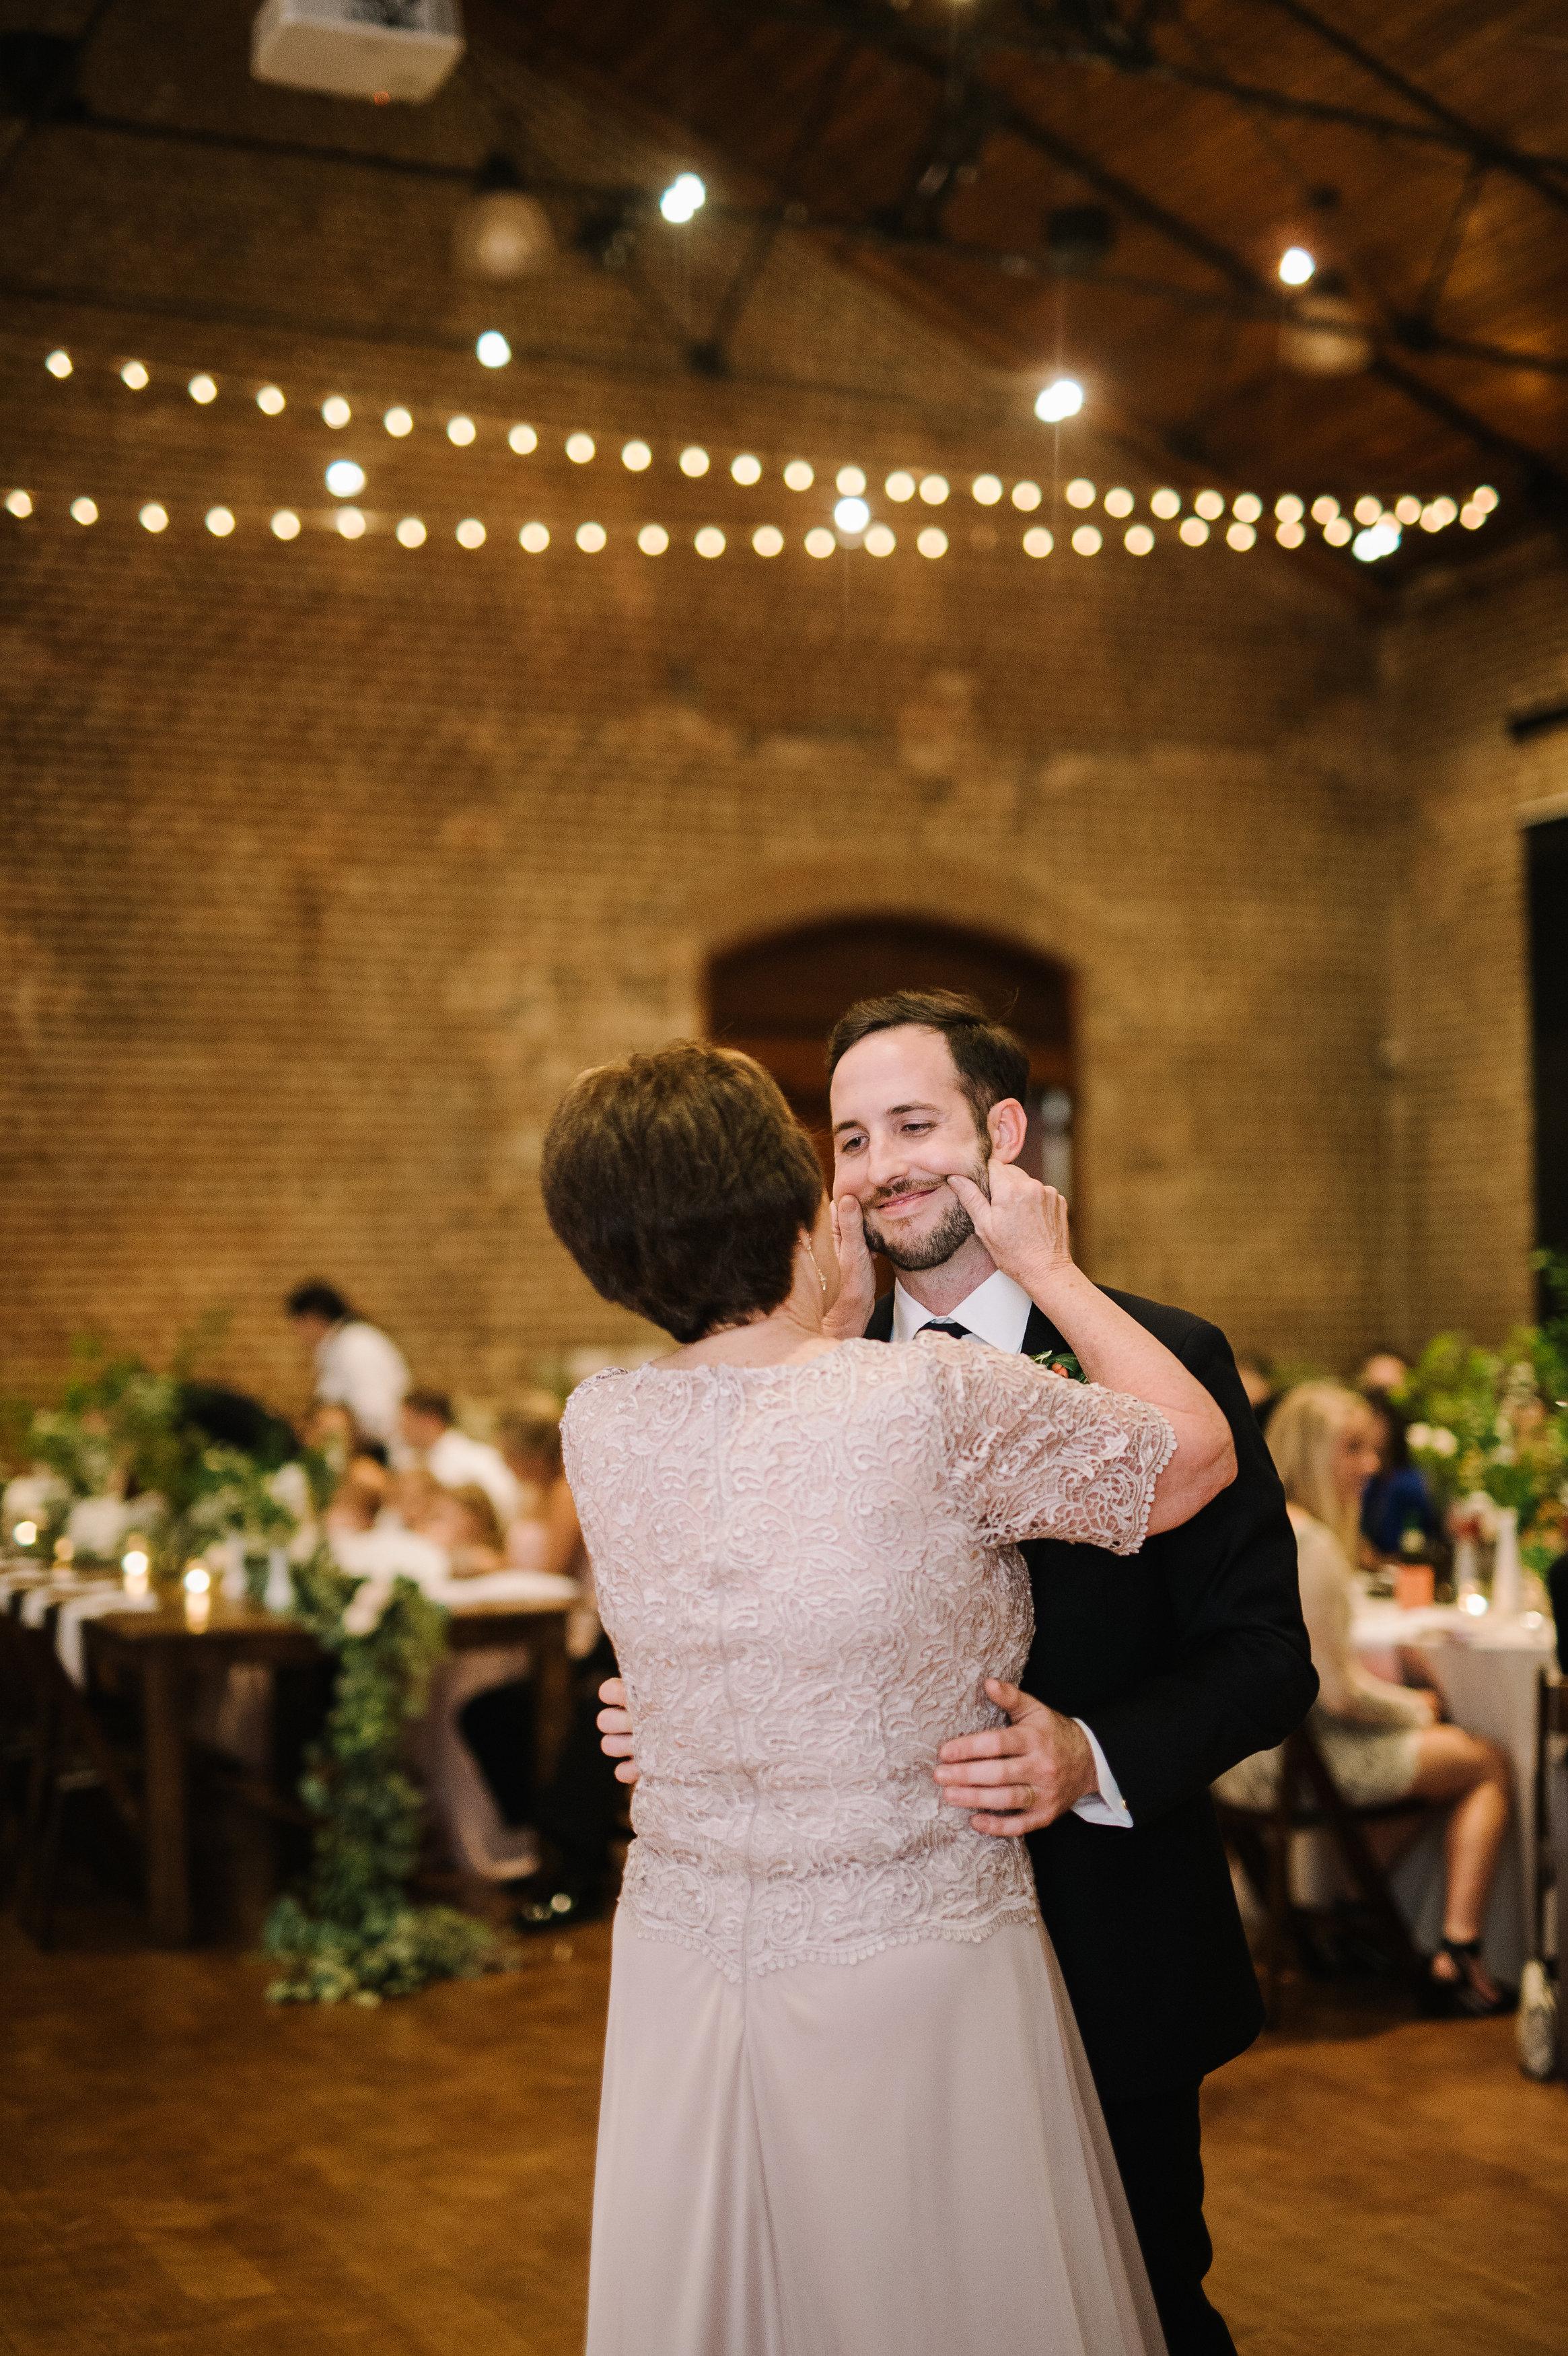 amber-and-paul-rach-loves-troy-charles-h-morris-center-wedding-sarah-seven-helene-lace-wedding-dress-ivory-and-beau-bridal-boutique-savannah-wedding-planner-savannah-event-designer-savannah-florist-savannah-weddings-savannah-bridal-boutique-43.jpg